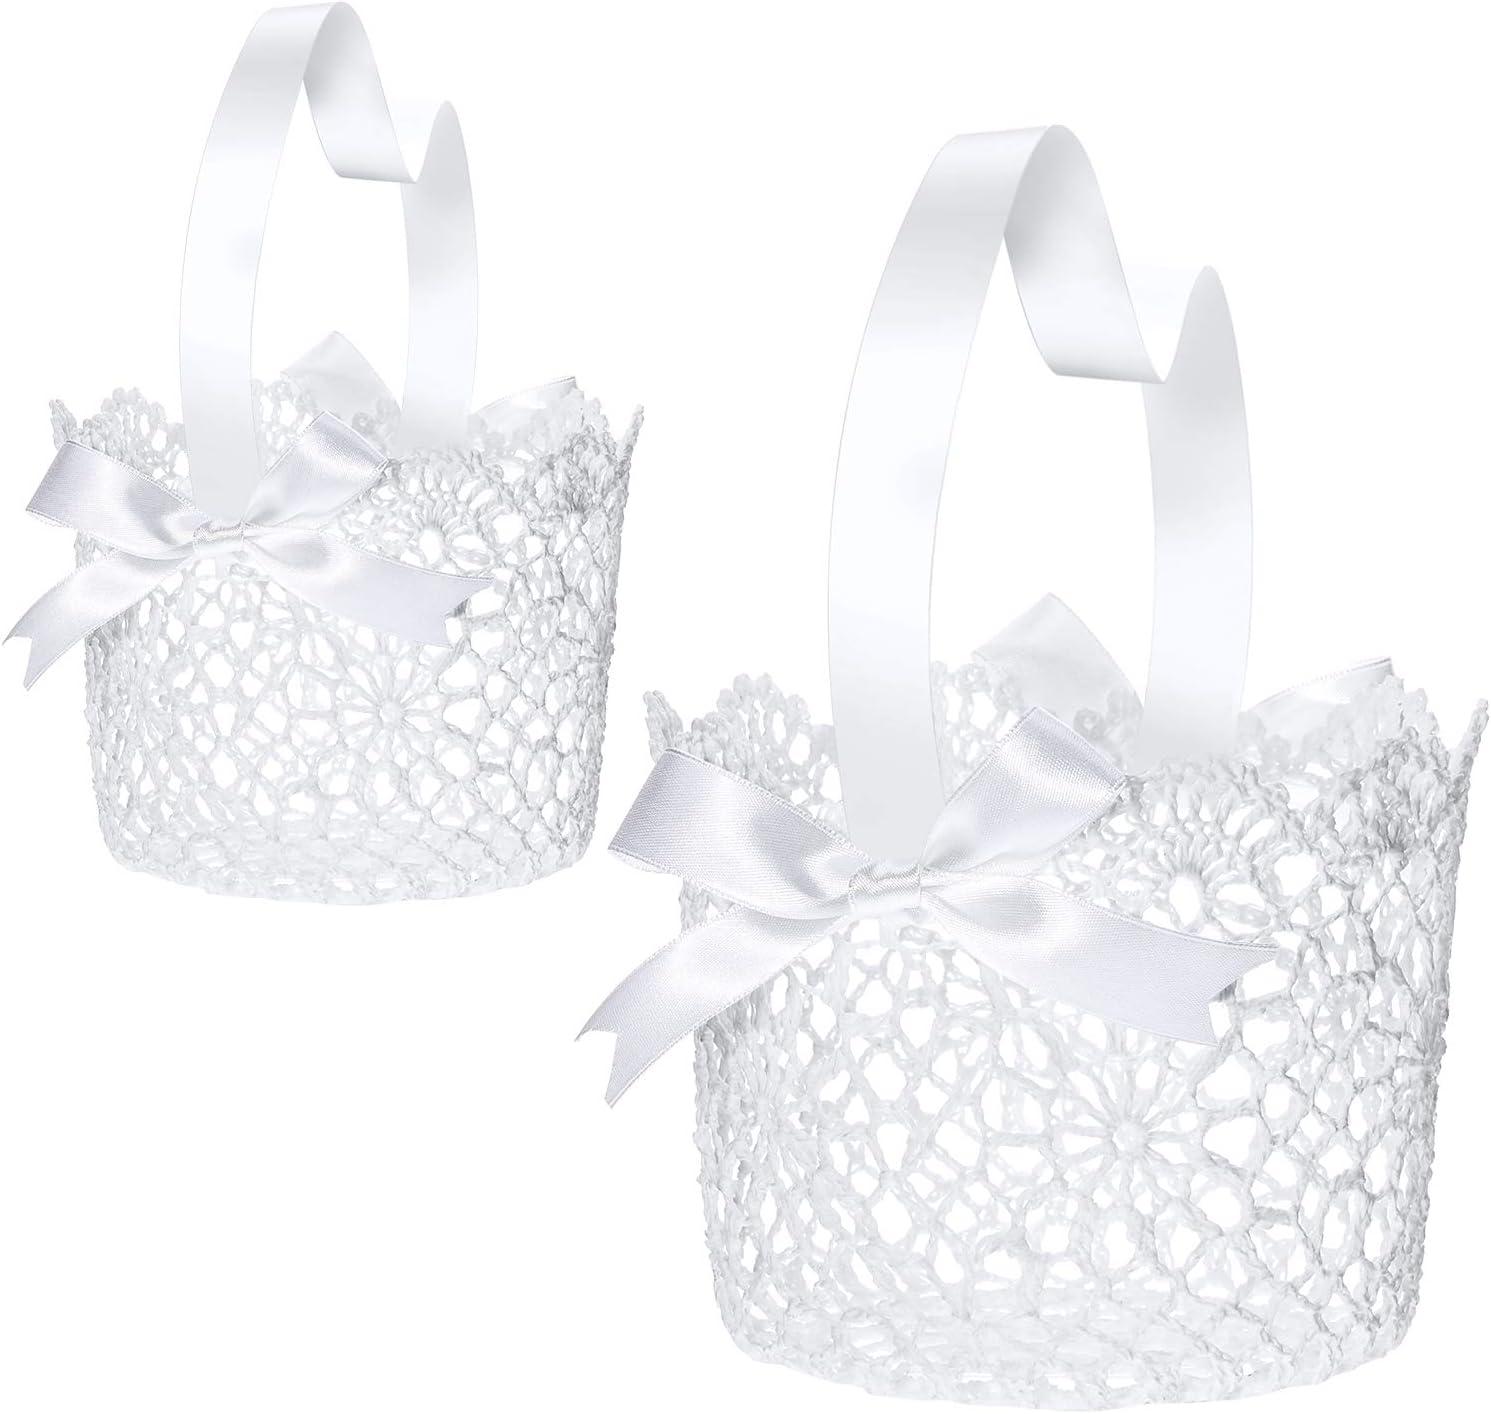 Boao White Handle Wedding Flower Girl Baskets, 2 Packs (5.90 x 4.72 x 4.33 Inch)